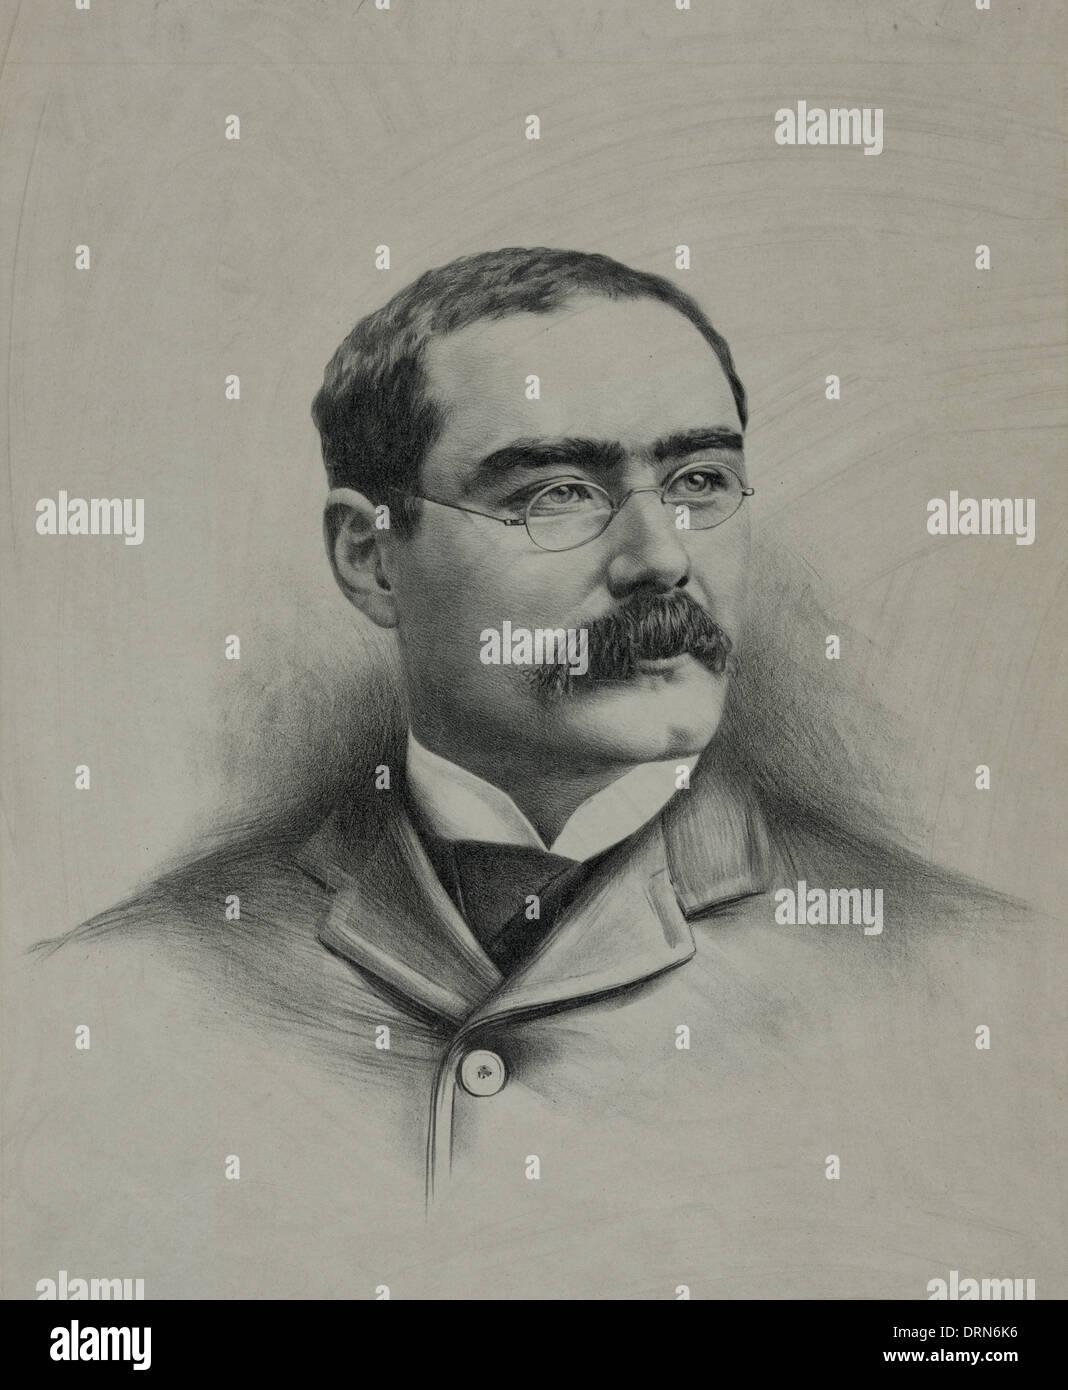 Rudyard Kipling Stock Photos & Rudyard Kipling Stock Images - Alamy